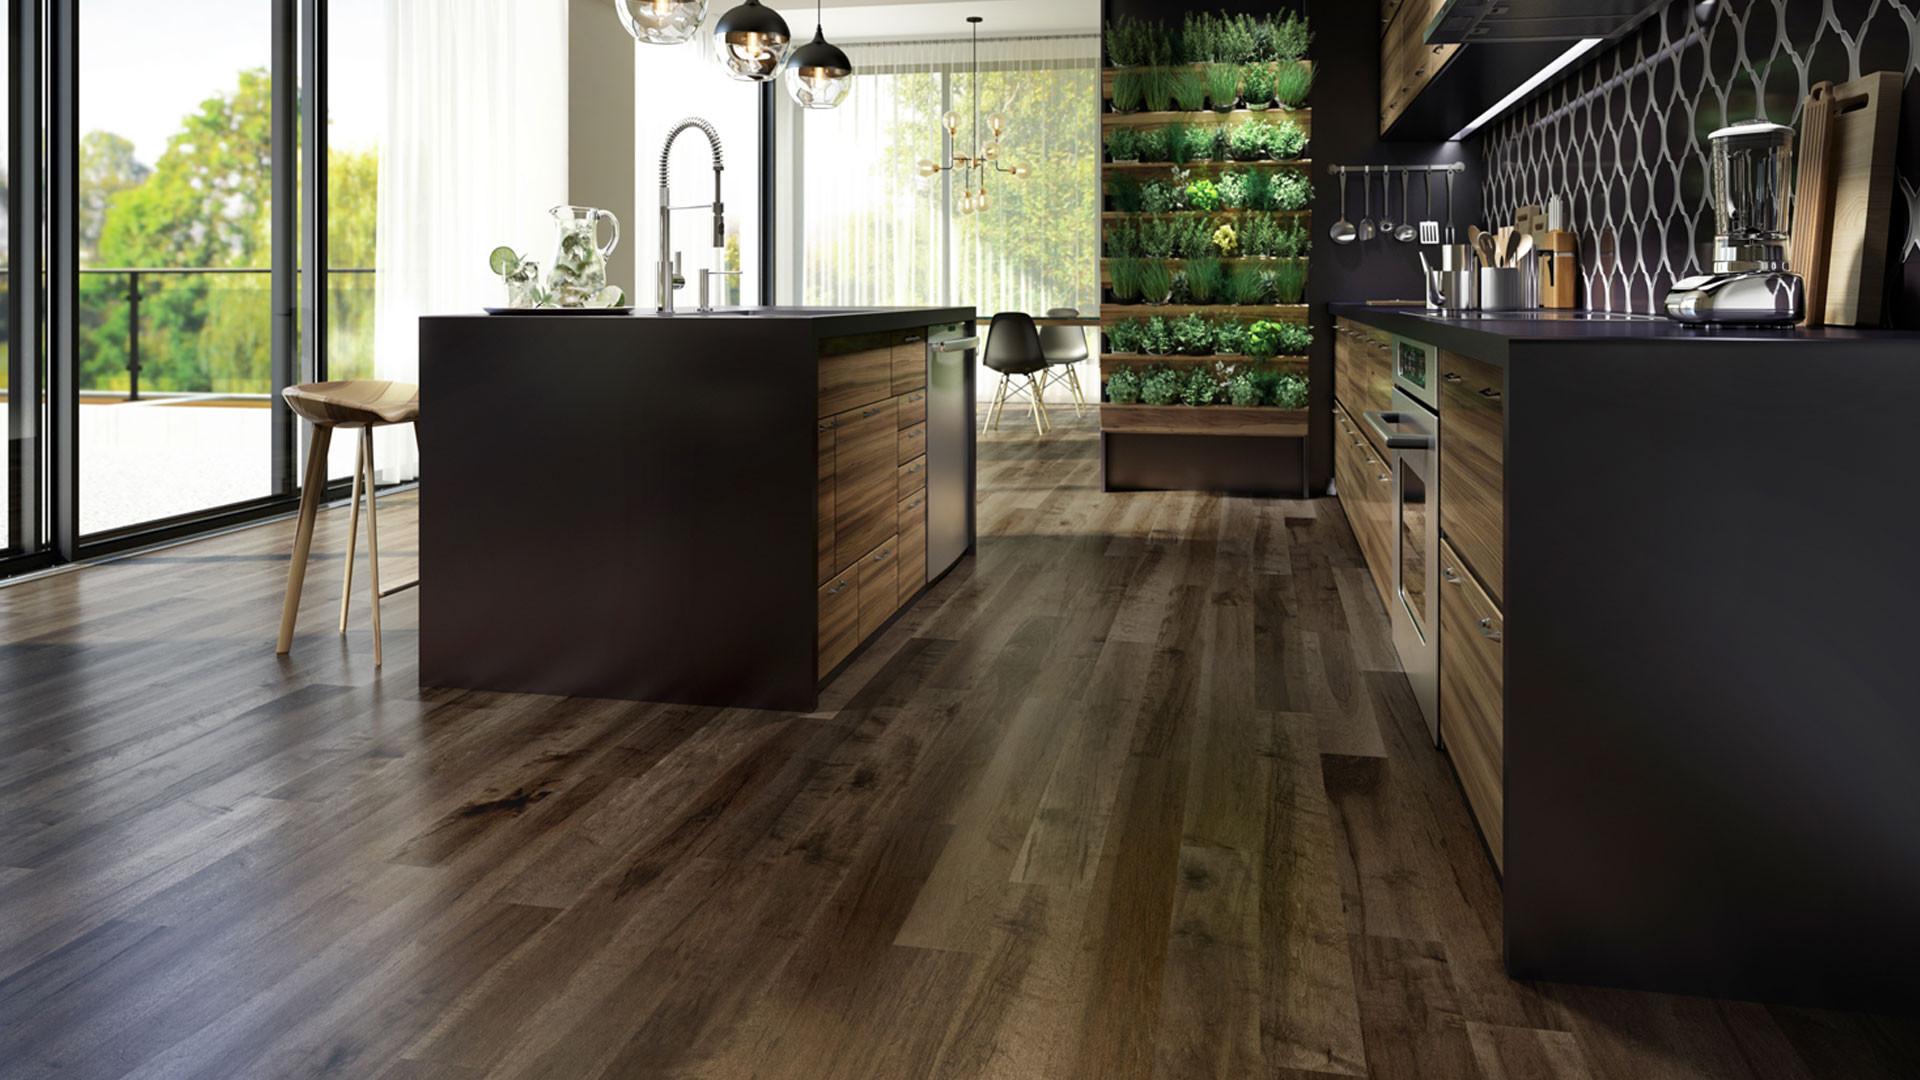 popular hardwood floor colors 2016 of 4 latest hardwood flooring trends lauzon flooring within top 4 hardwood flooring trends